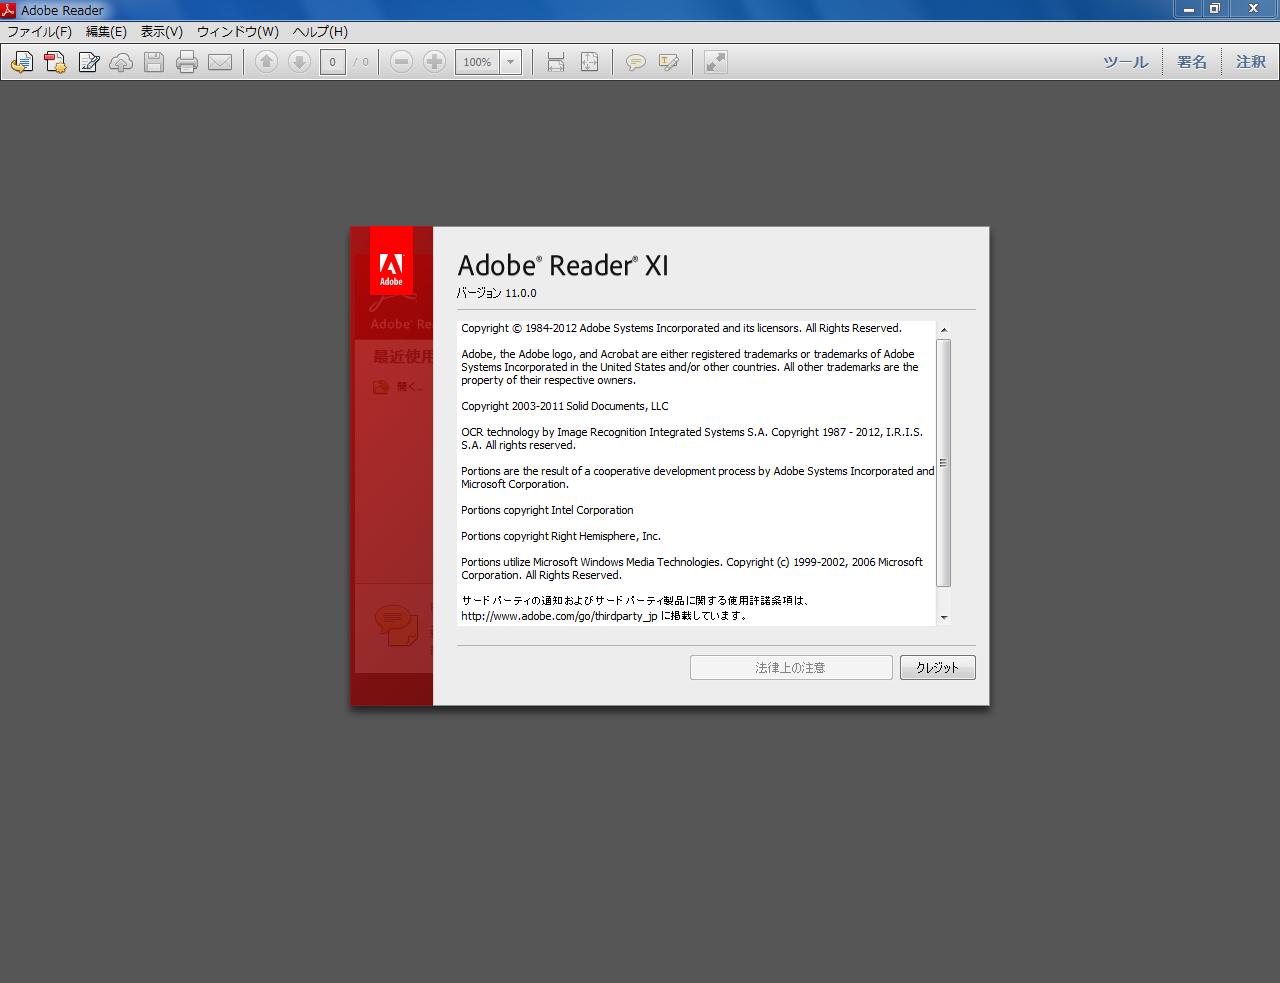 adobe reader pour mac 10.4.11